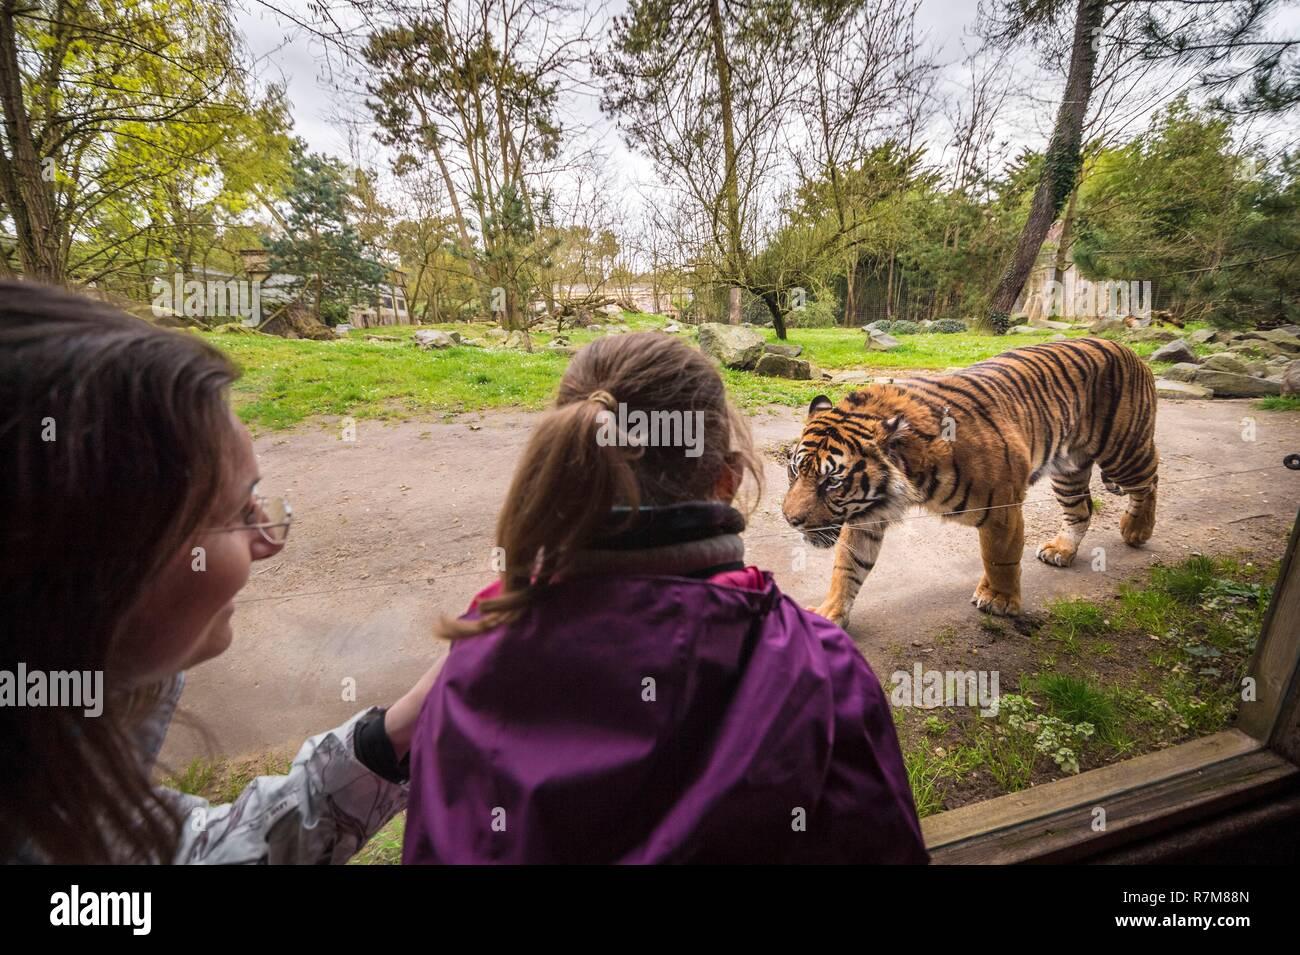 France, Sarthe, La Fleche, La Fleche Zoo, family observation of a Sumatran Tiger (Panthera tigris sumatrae)otection Status, Washington Convention Appendix I A (CITES), IUCN Status, Critical Risk of Extinction (CR) - Stock Image